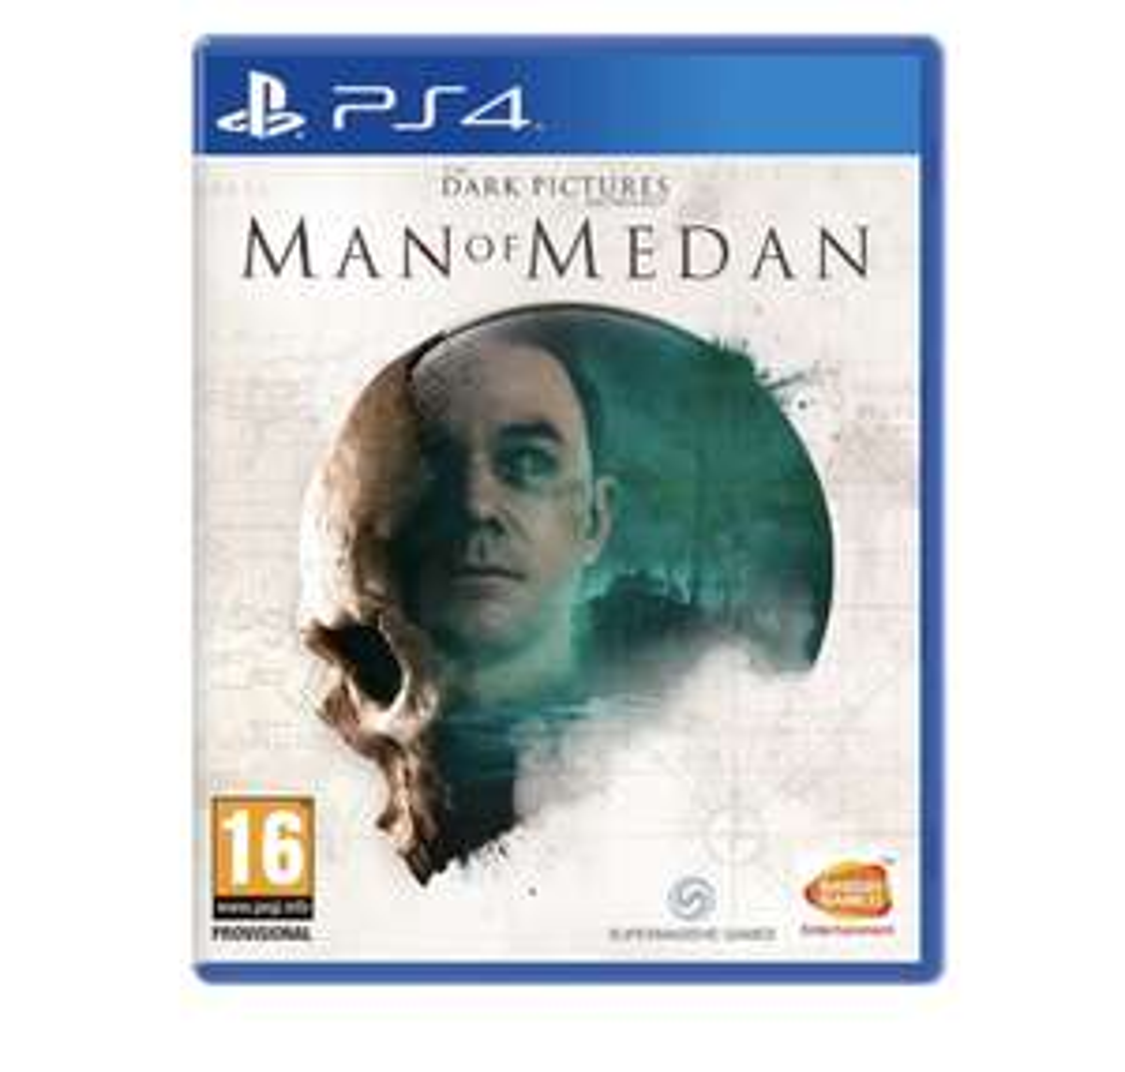 The dark pictures of anthology - Man of Medan PS4 Game @ Smyths for £10 (C&C)